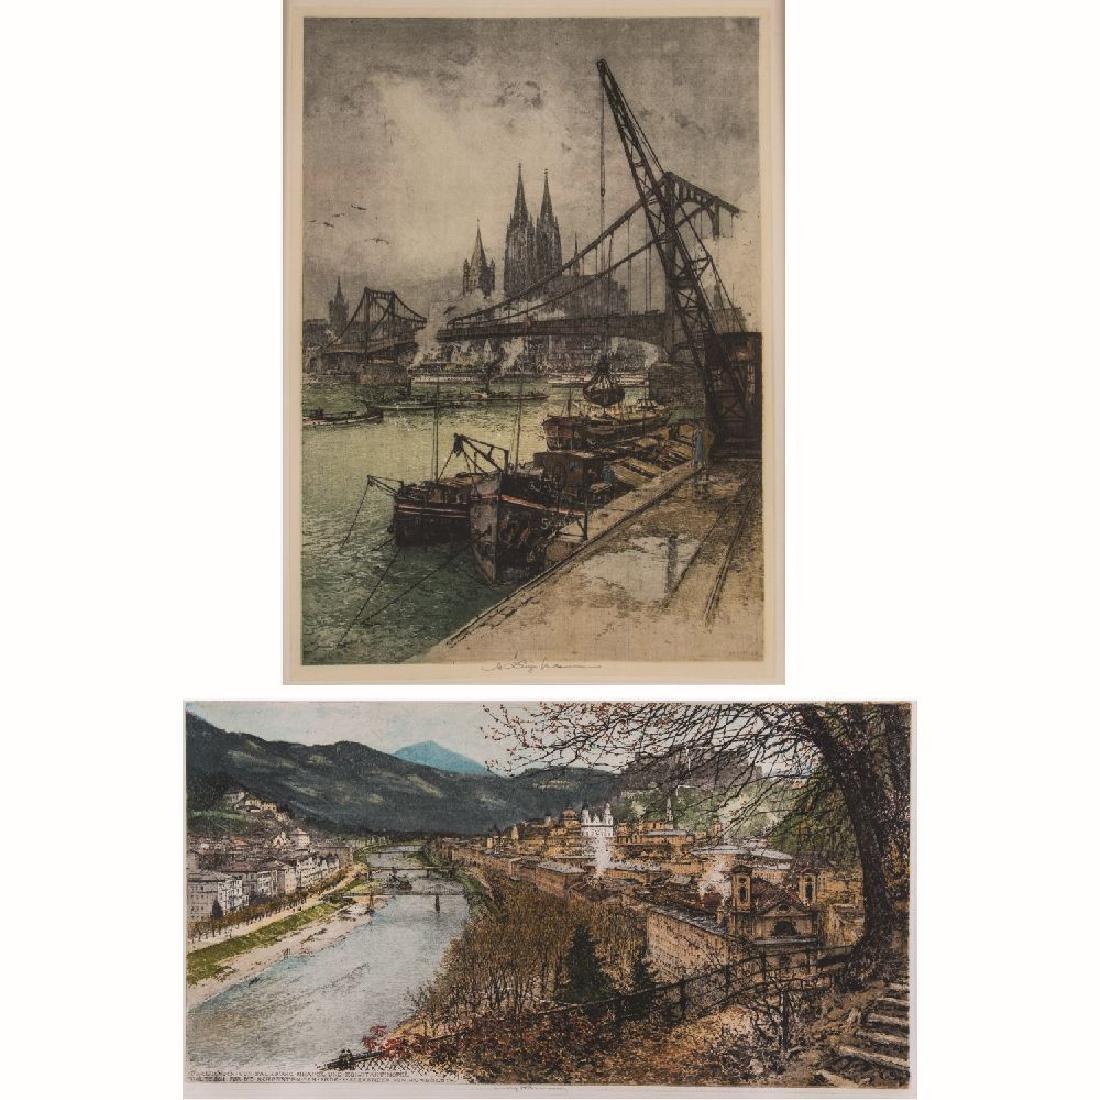 Luigi Kasimir (1881-1962) 'Cologne' and 'Salzburg', Two